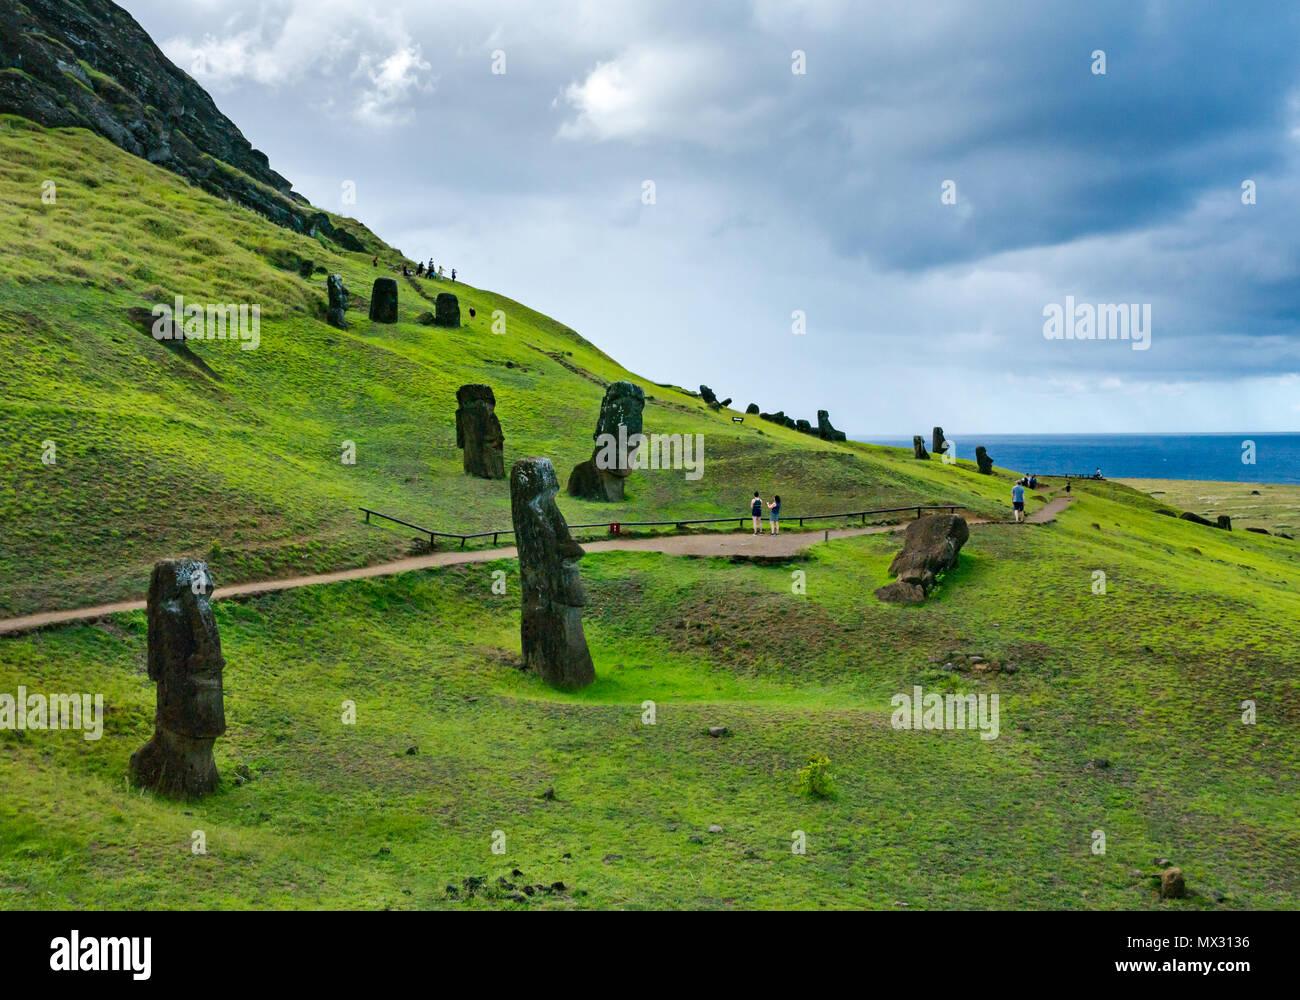 Unfinished and abandoned Moai heads, Rano Raraku quarry, Easter Island, Rapa Nui, Chile - Stock Image